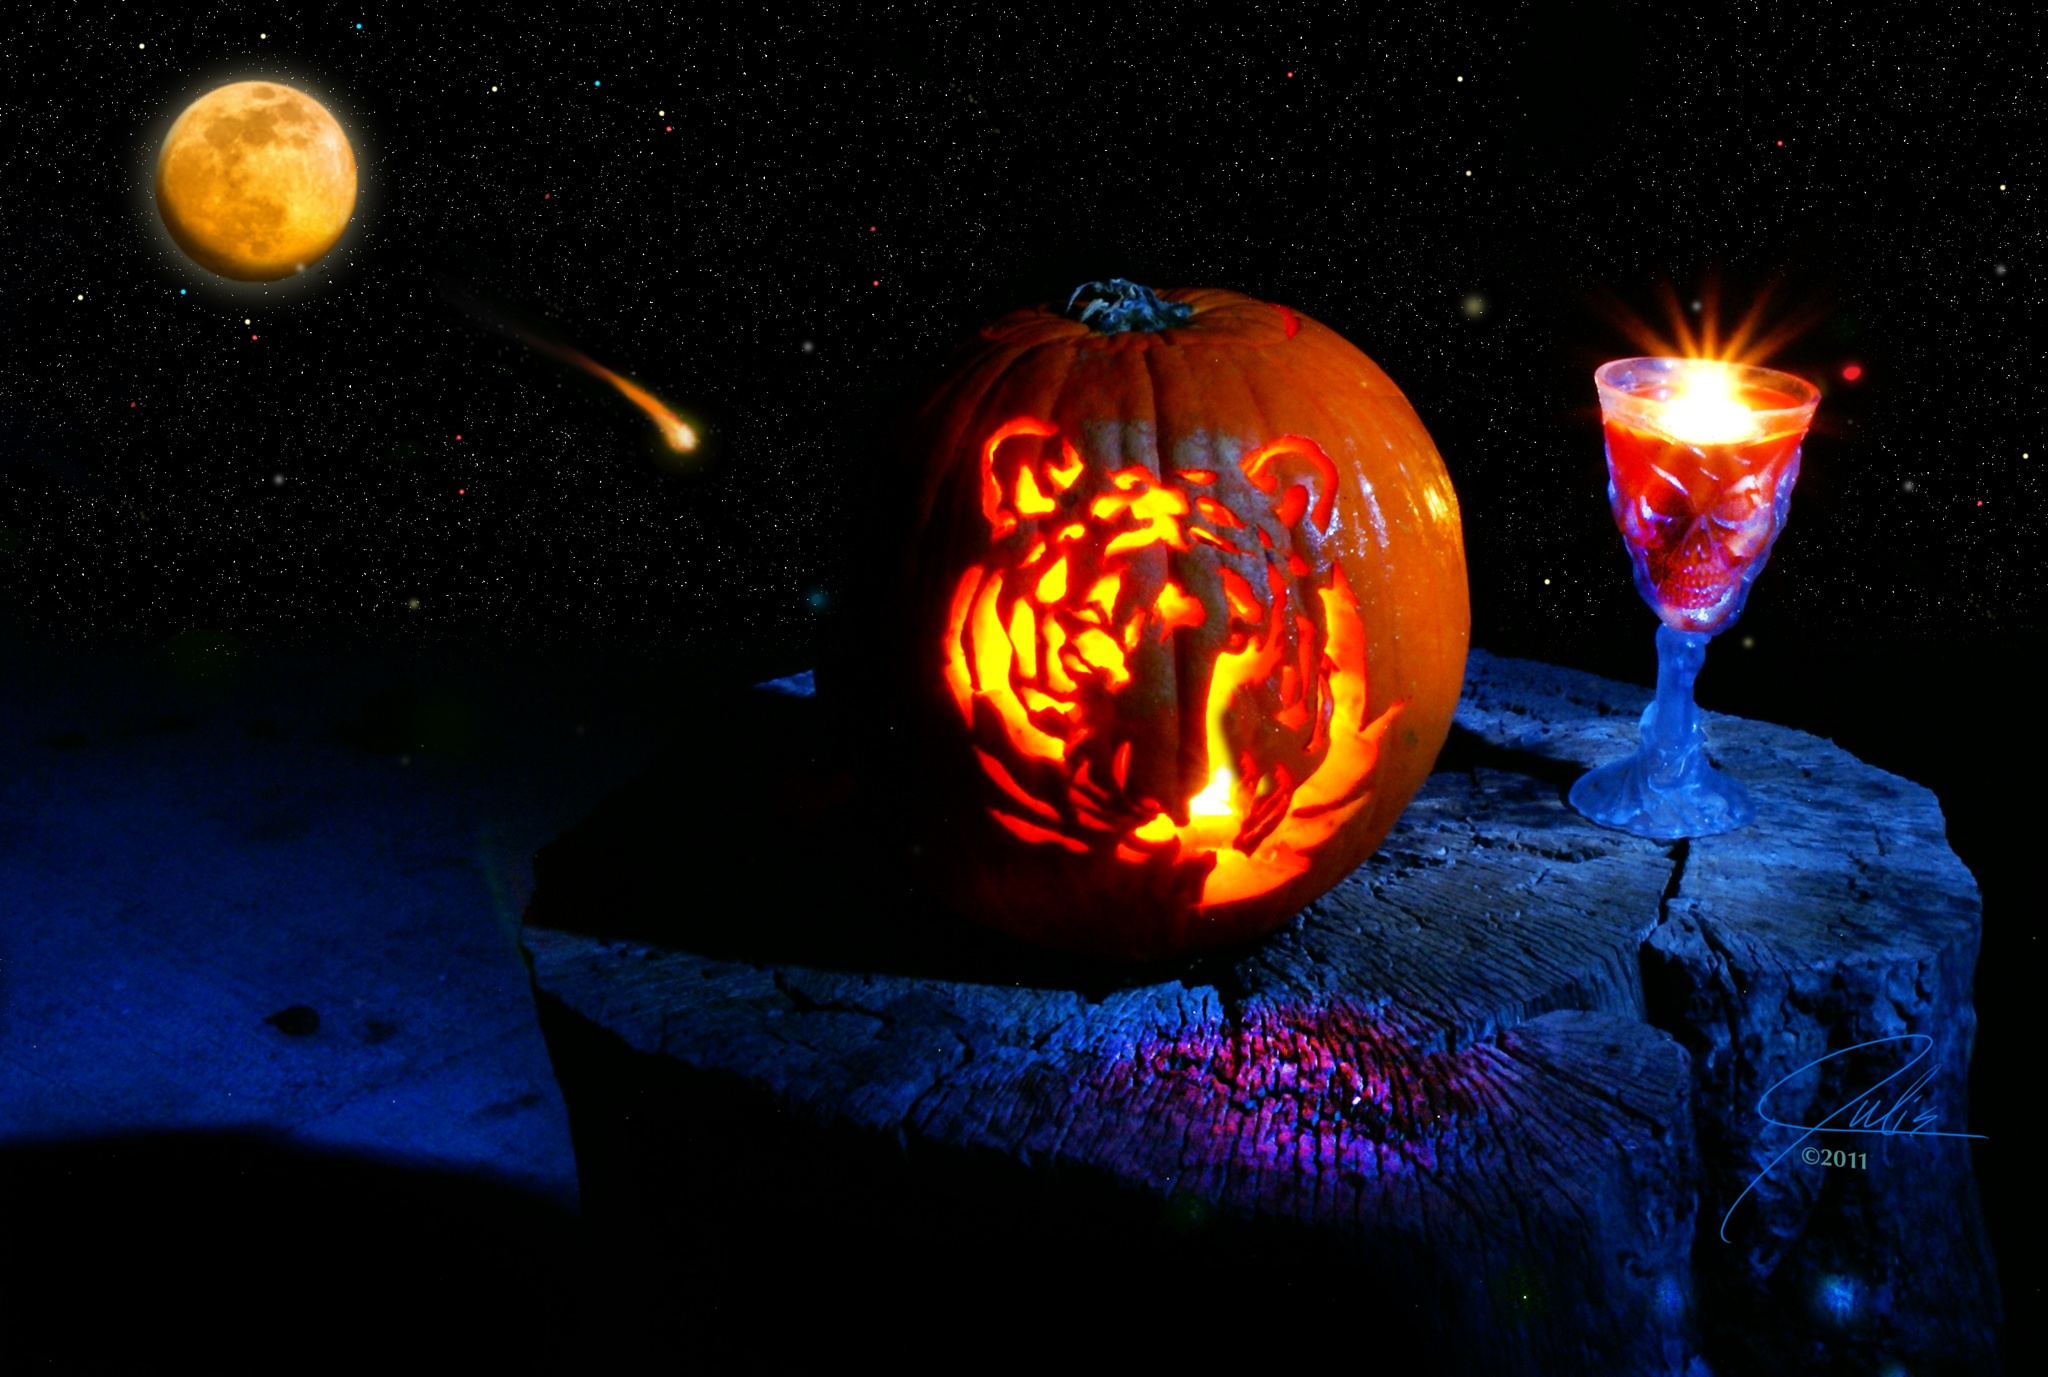 Harvest Moon Pumpkin by Julieanne Marie Benson